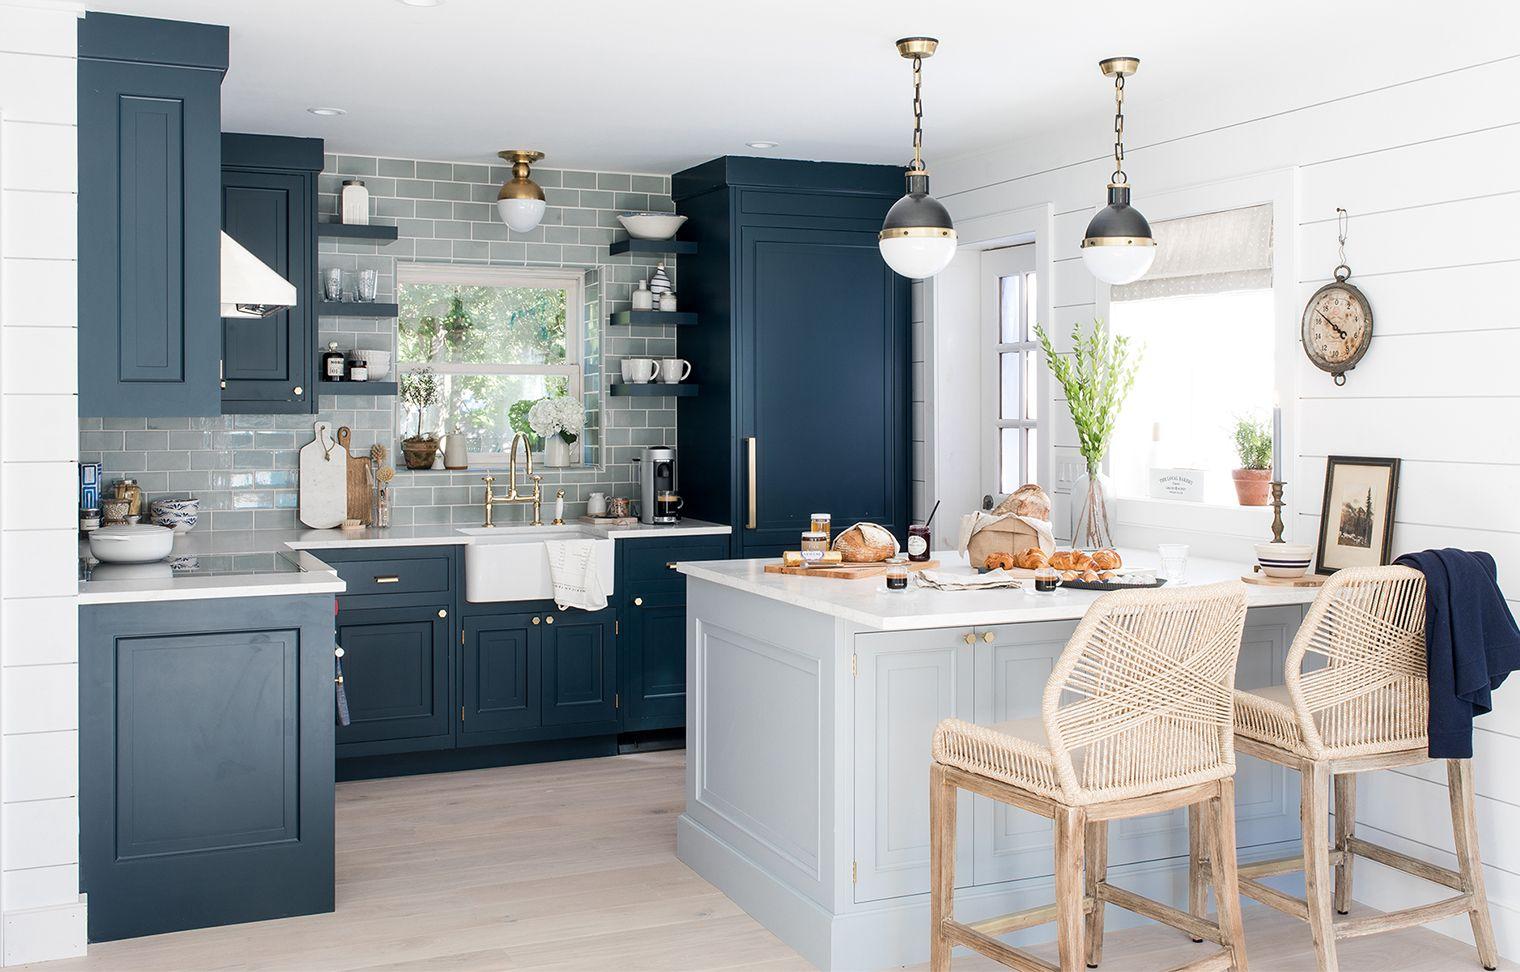 15 blue kitchen design ideas blue kitchen walls rh housebeautiful com blue and white kitchen decor blue and white kitchens pictures